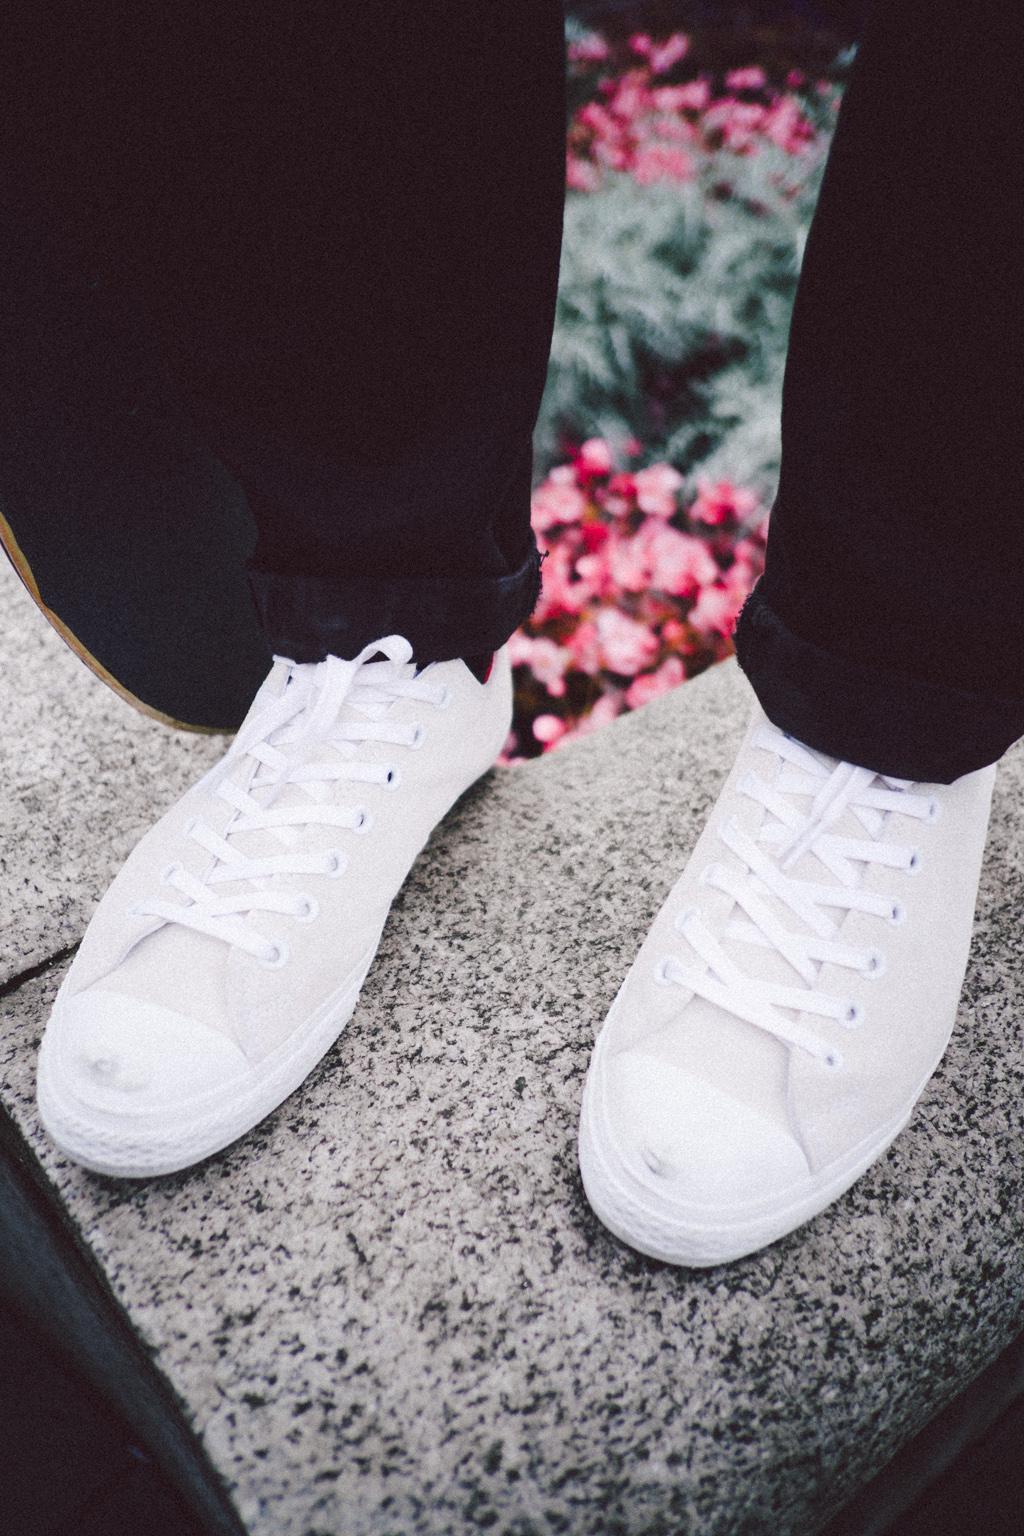 BILDER_PLACE_cons-weartest_lowres-27